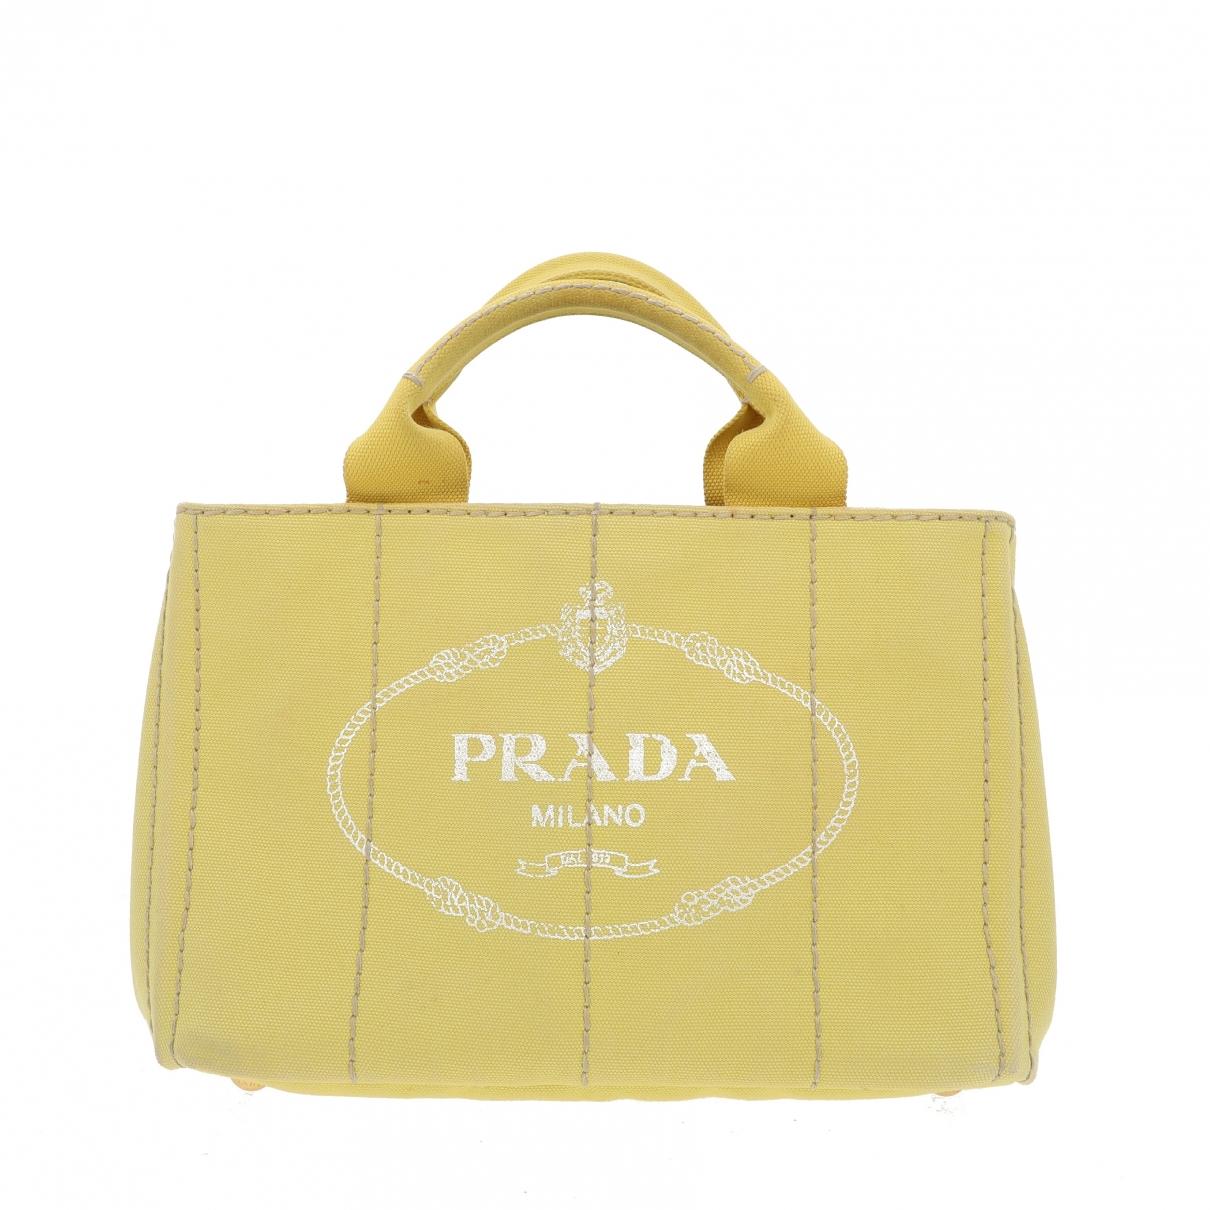 Prada - Sac a main   pour femme en toile - jaune